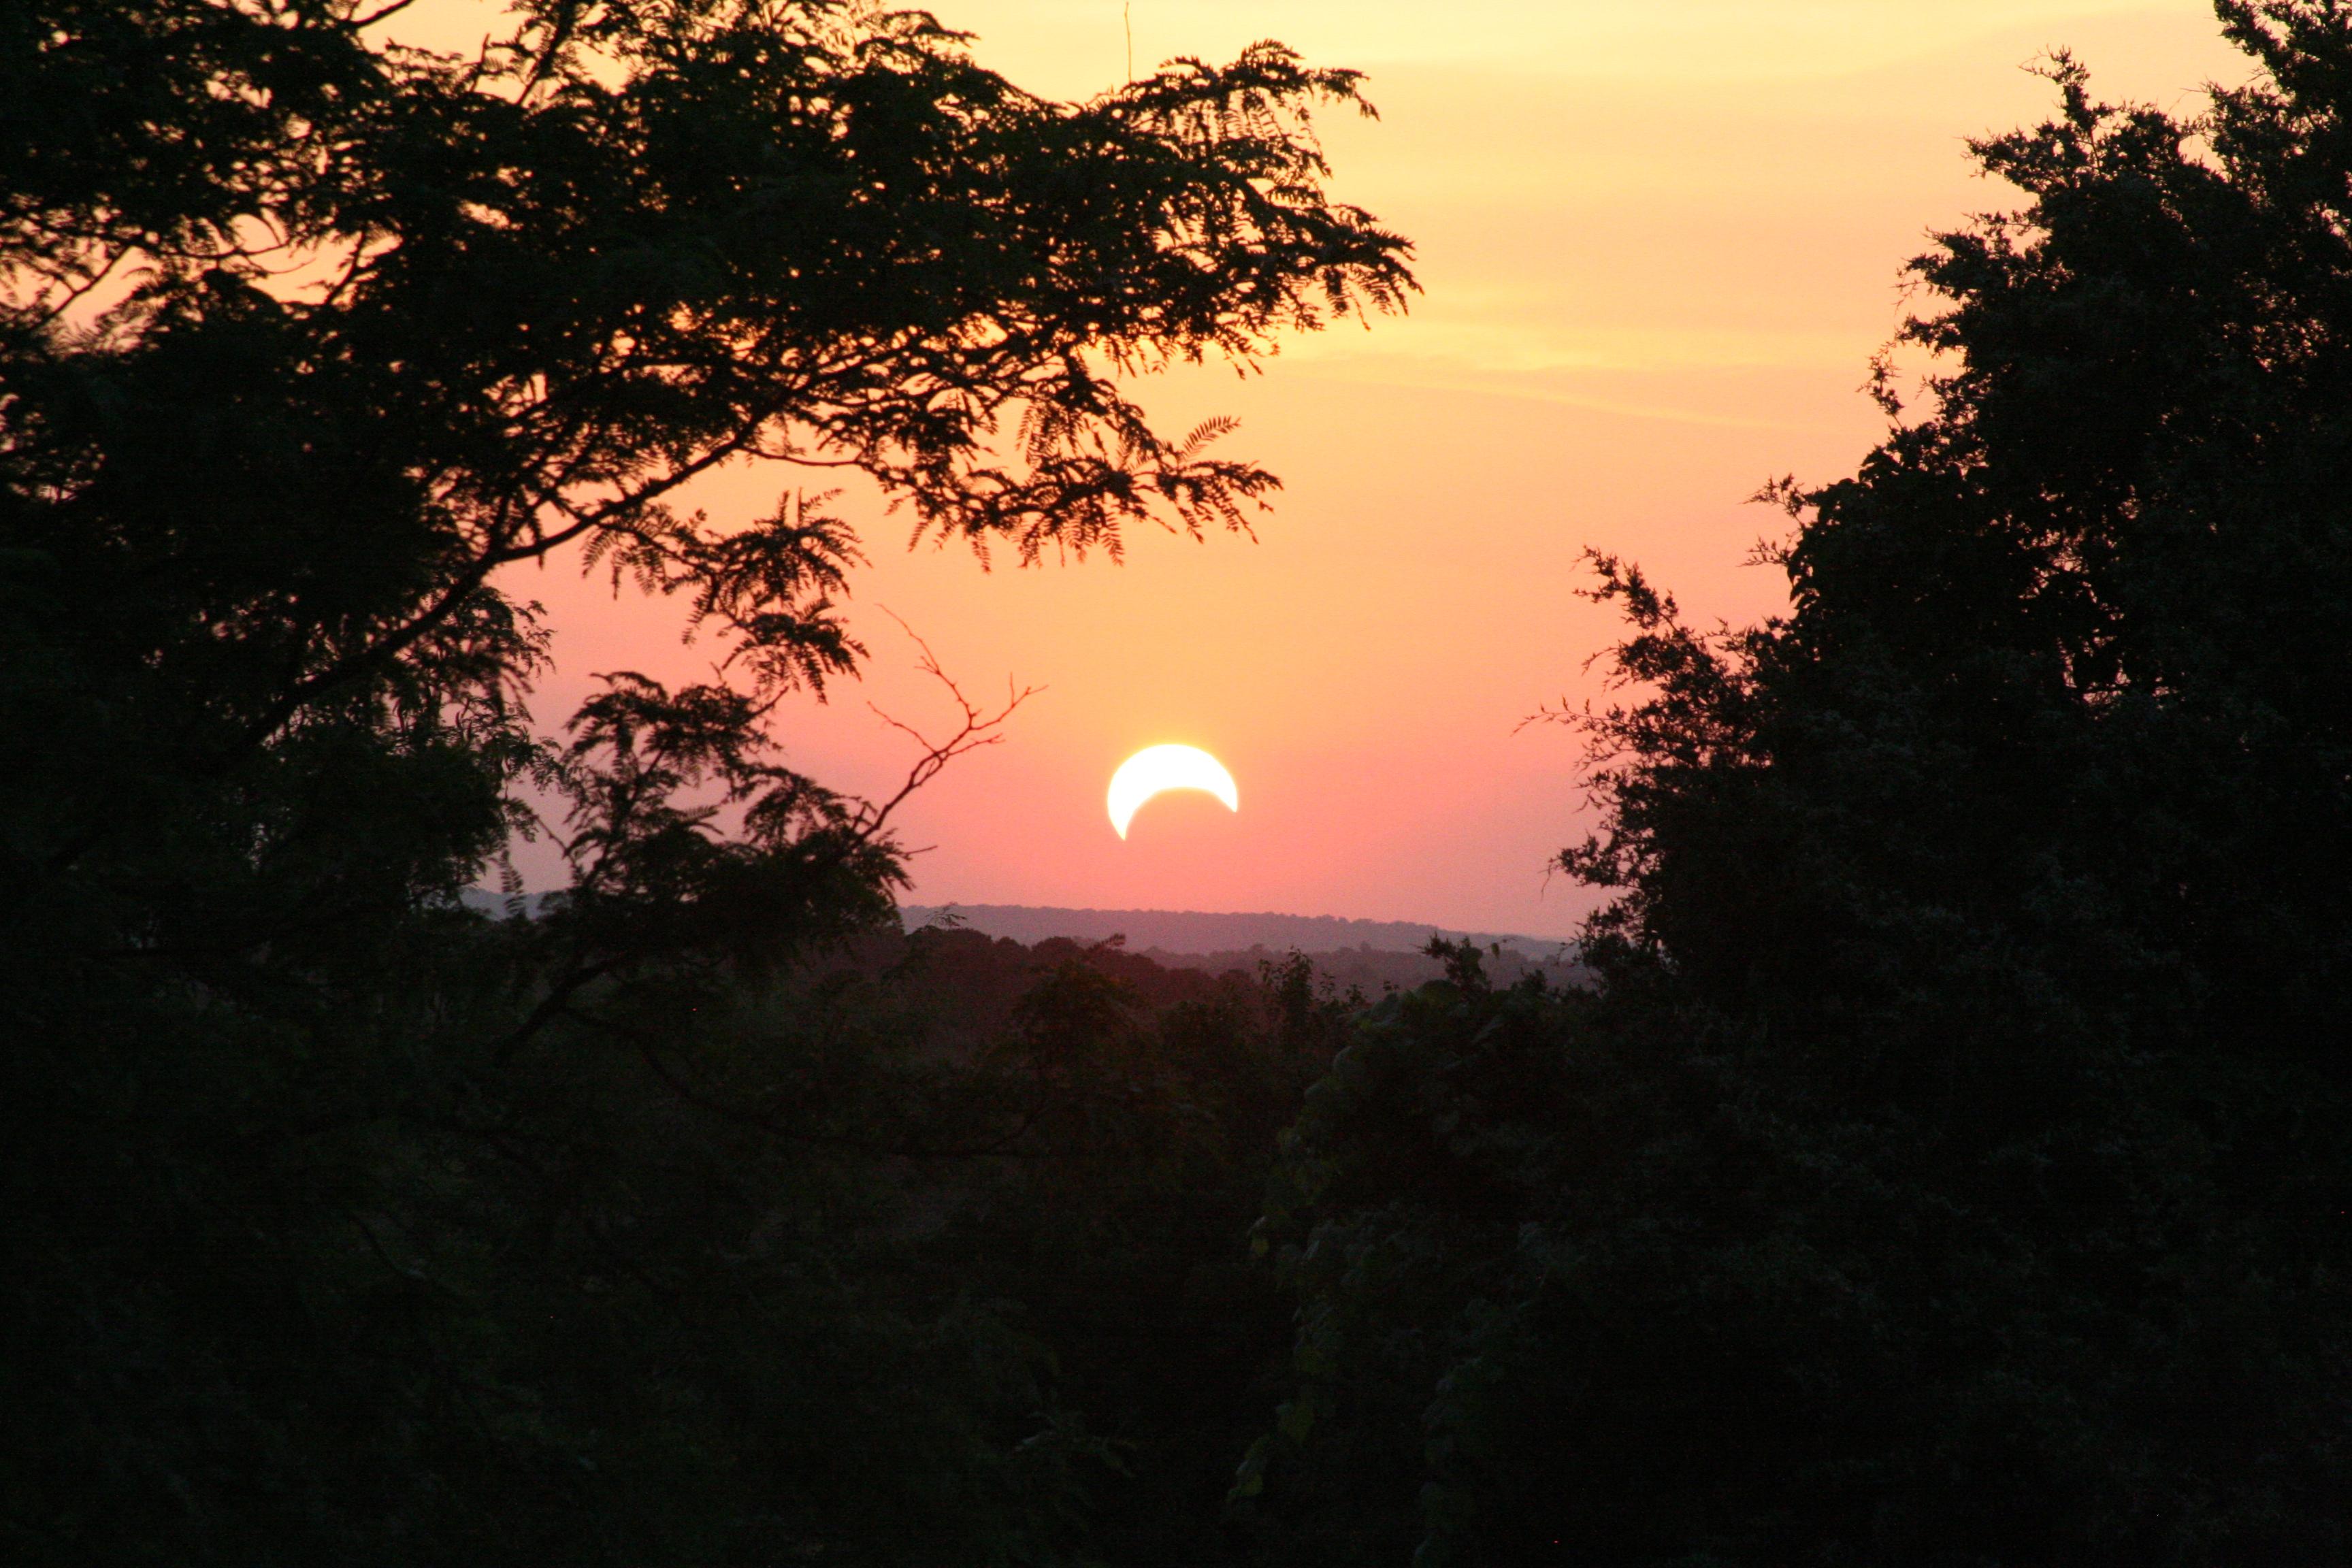 May 20,2012 Eclipse, Alma, AR